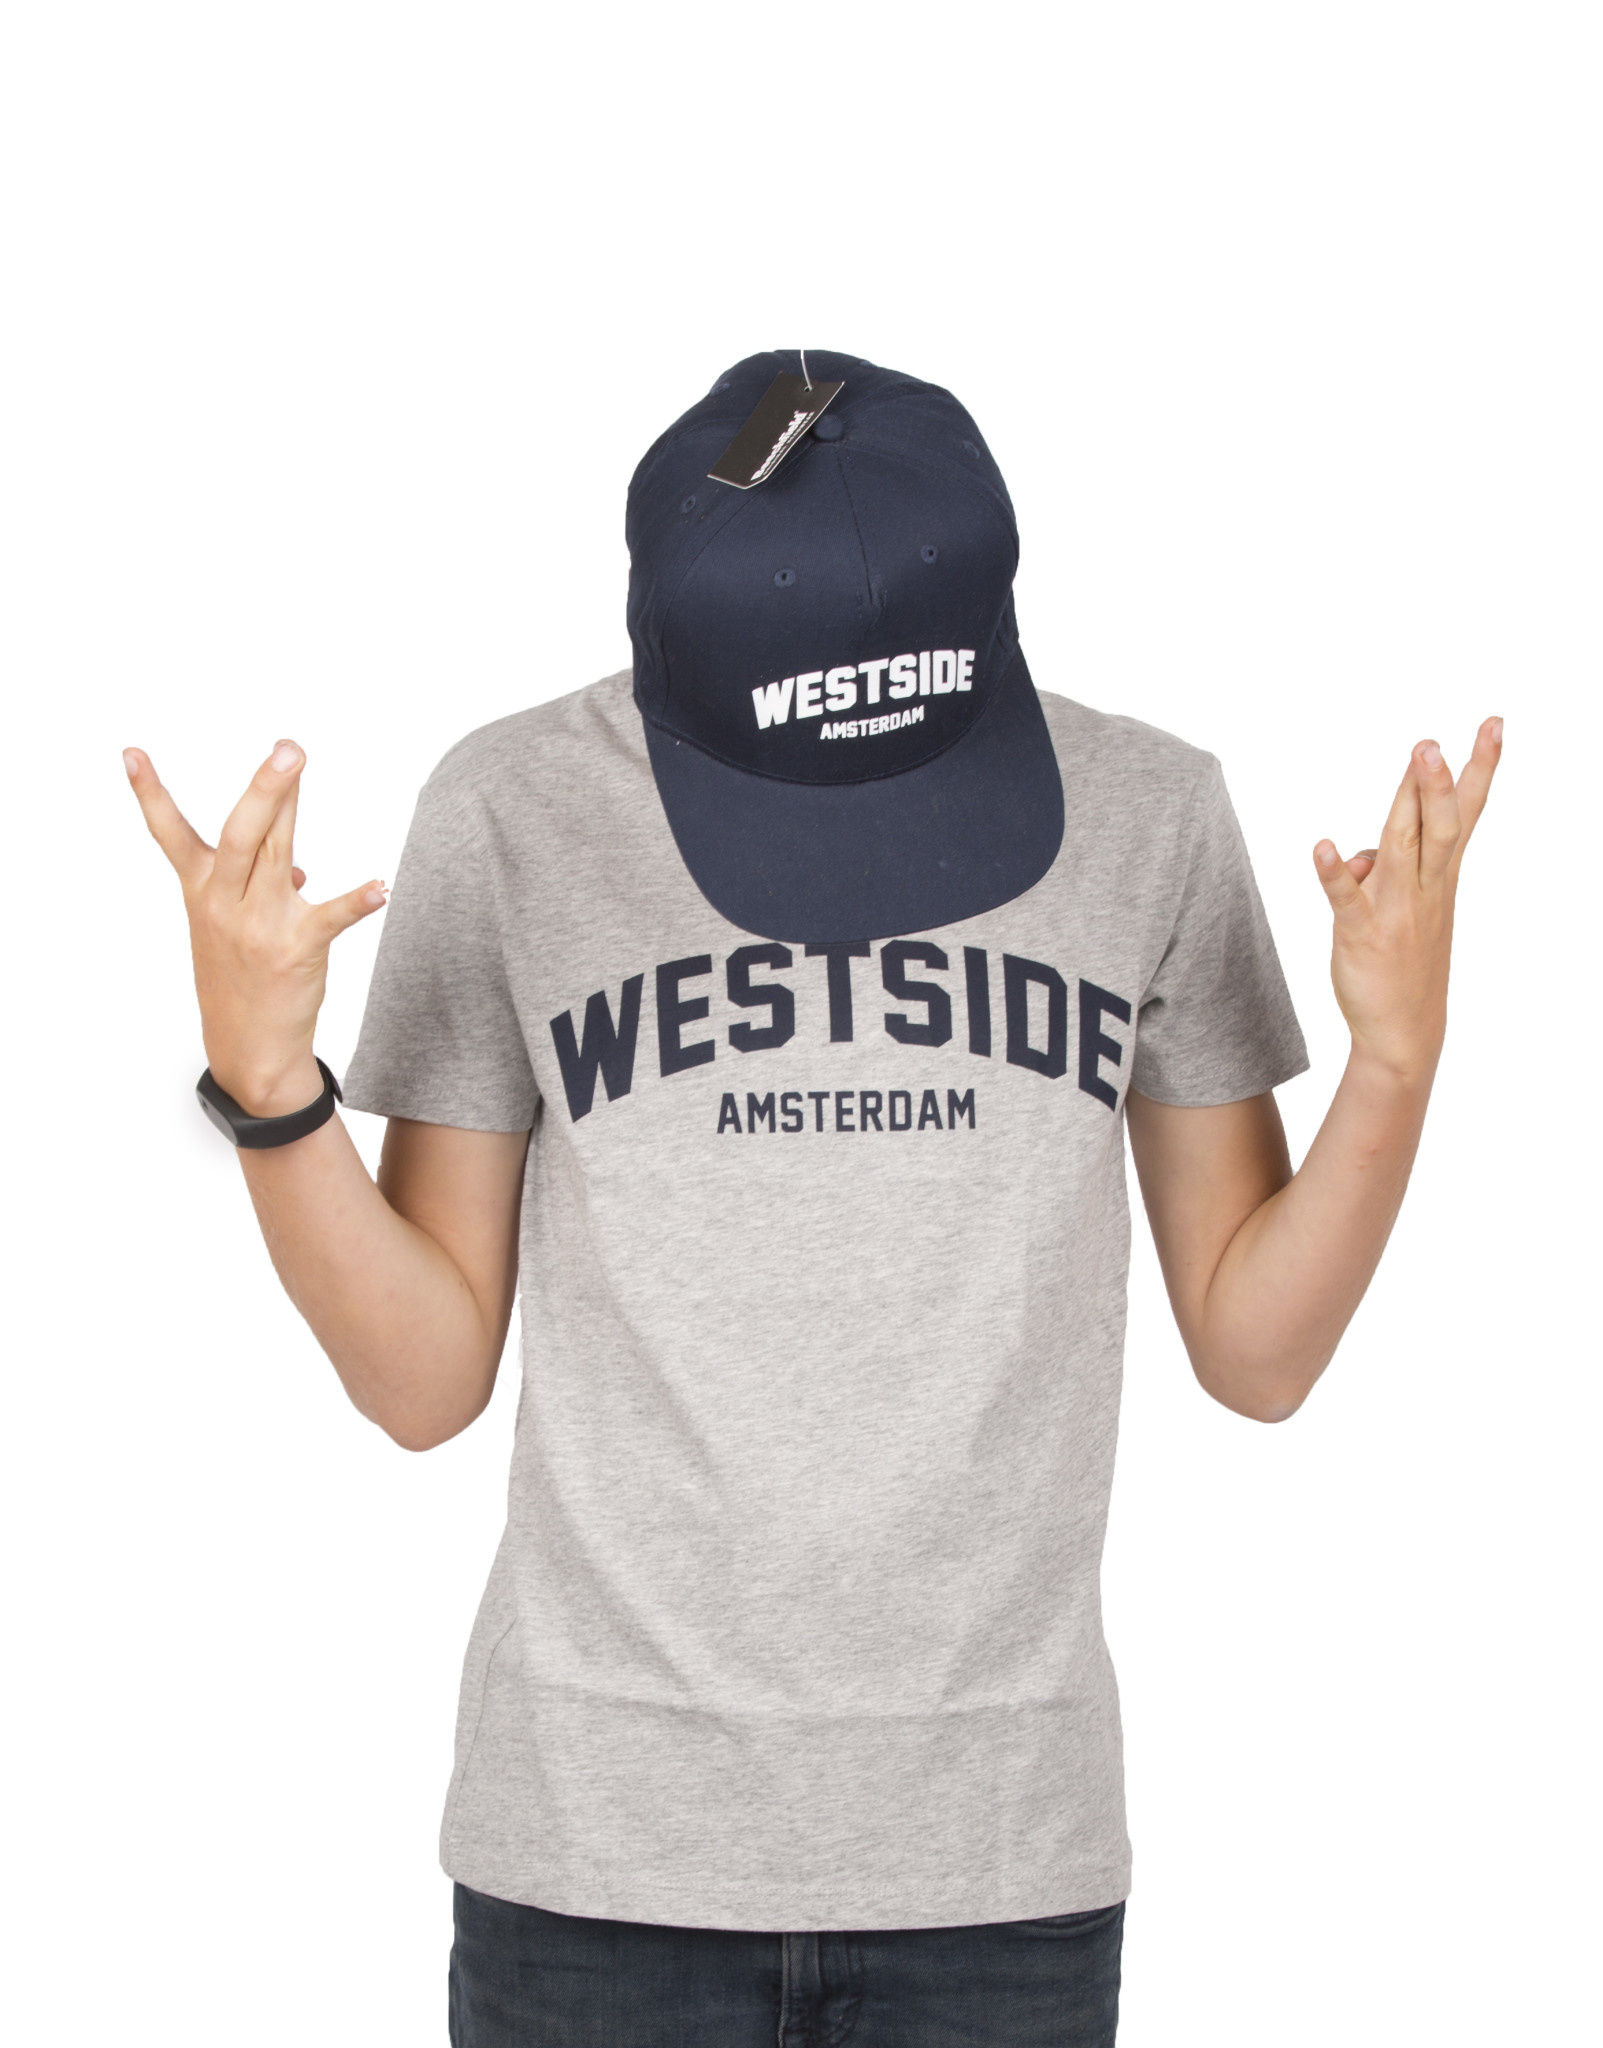 Westside Amsterdam T-shirt